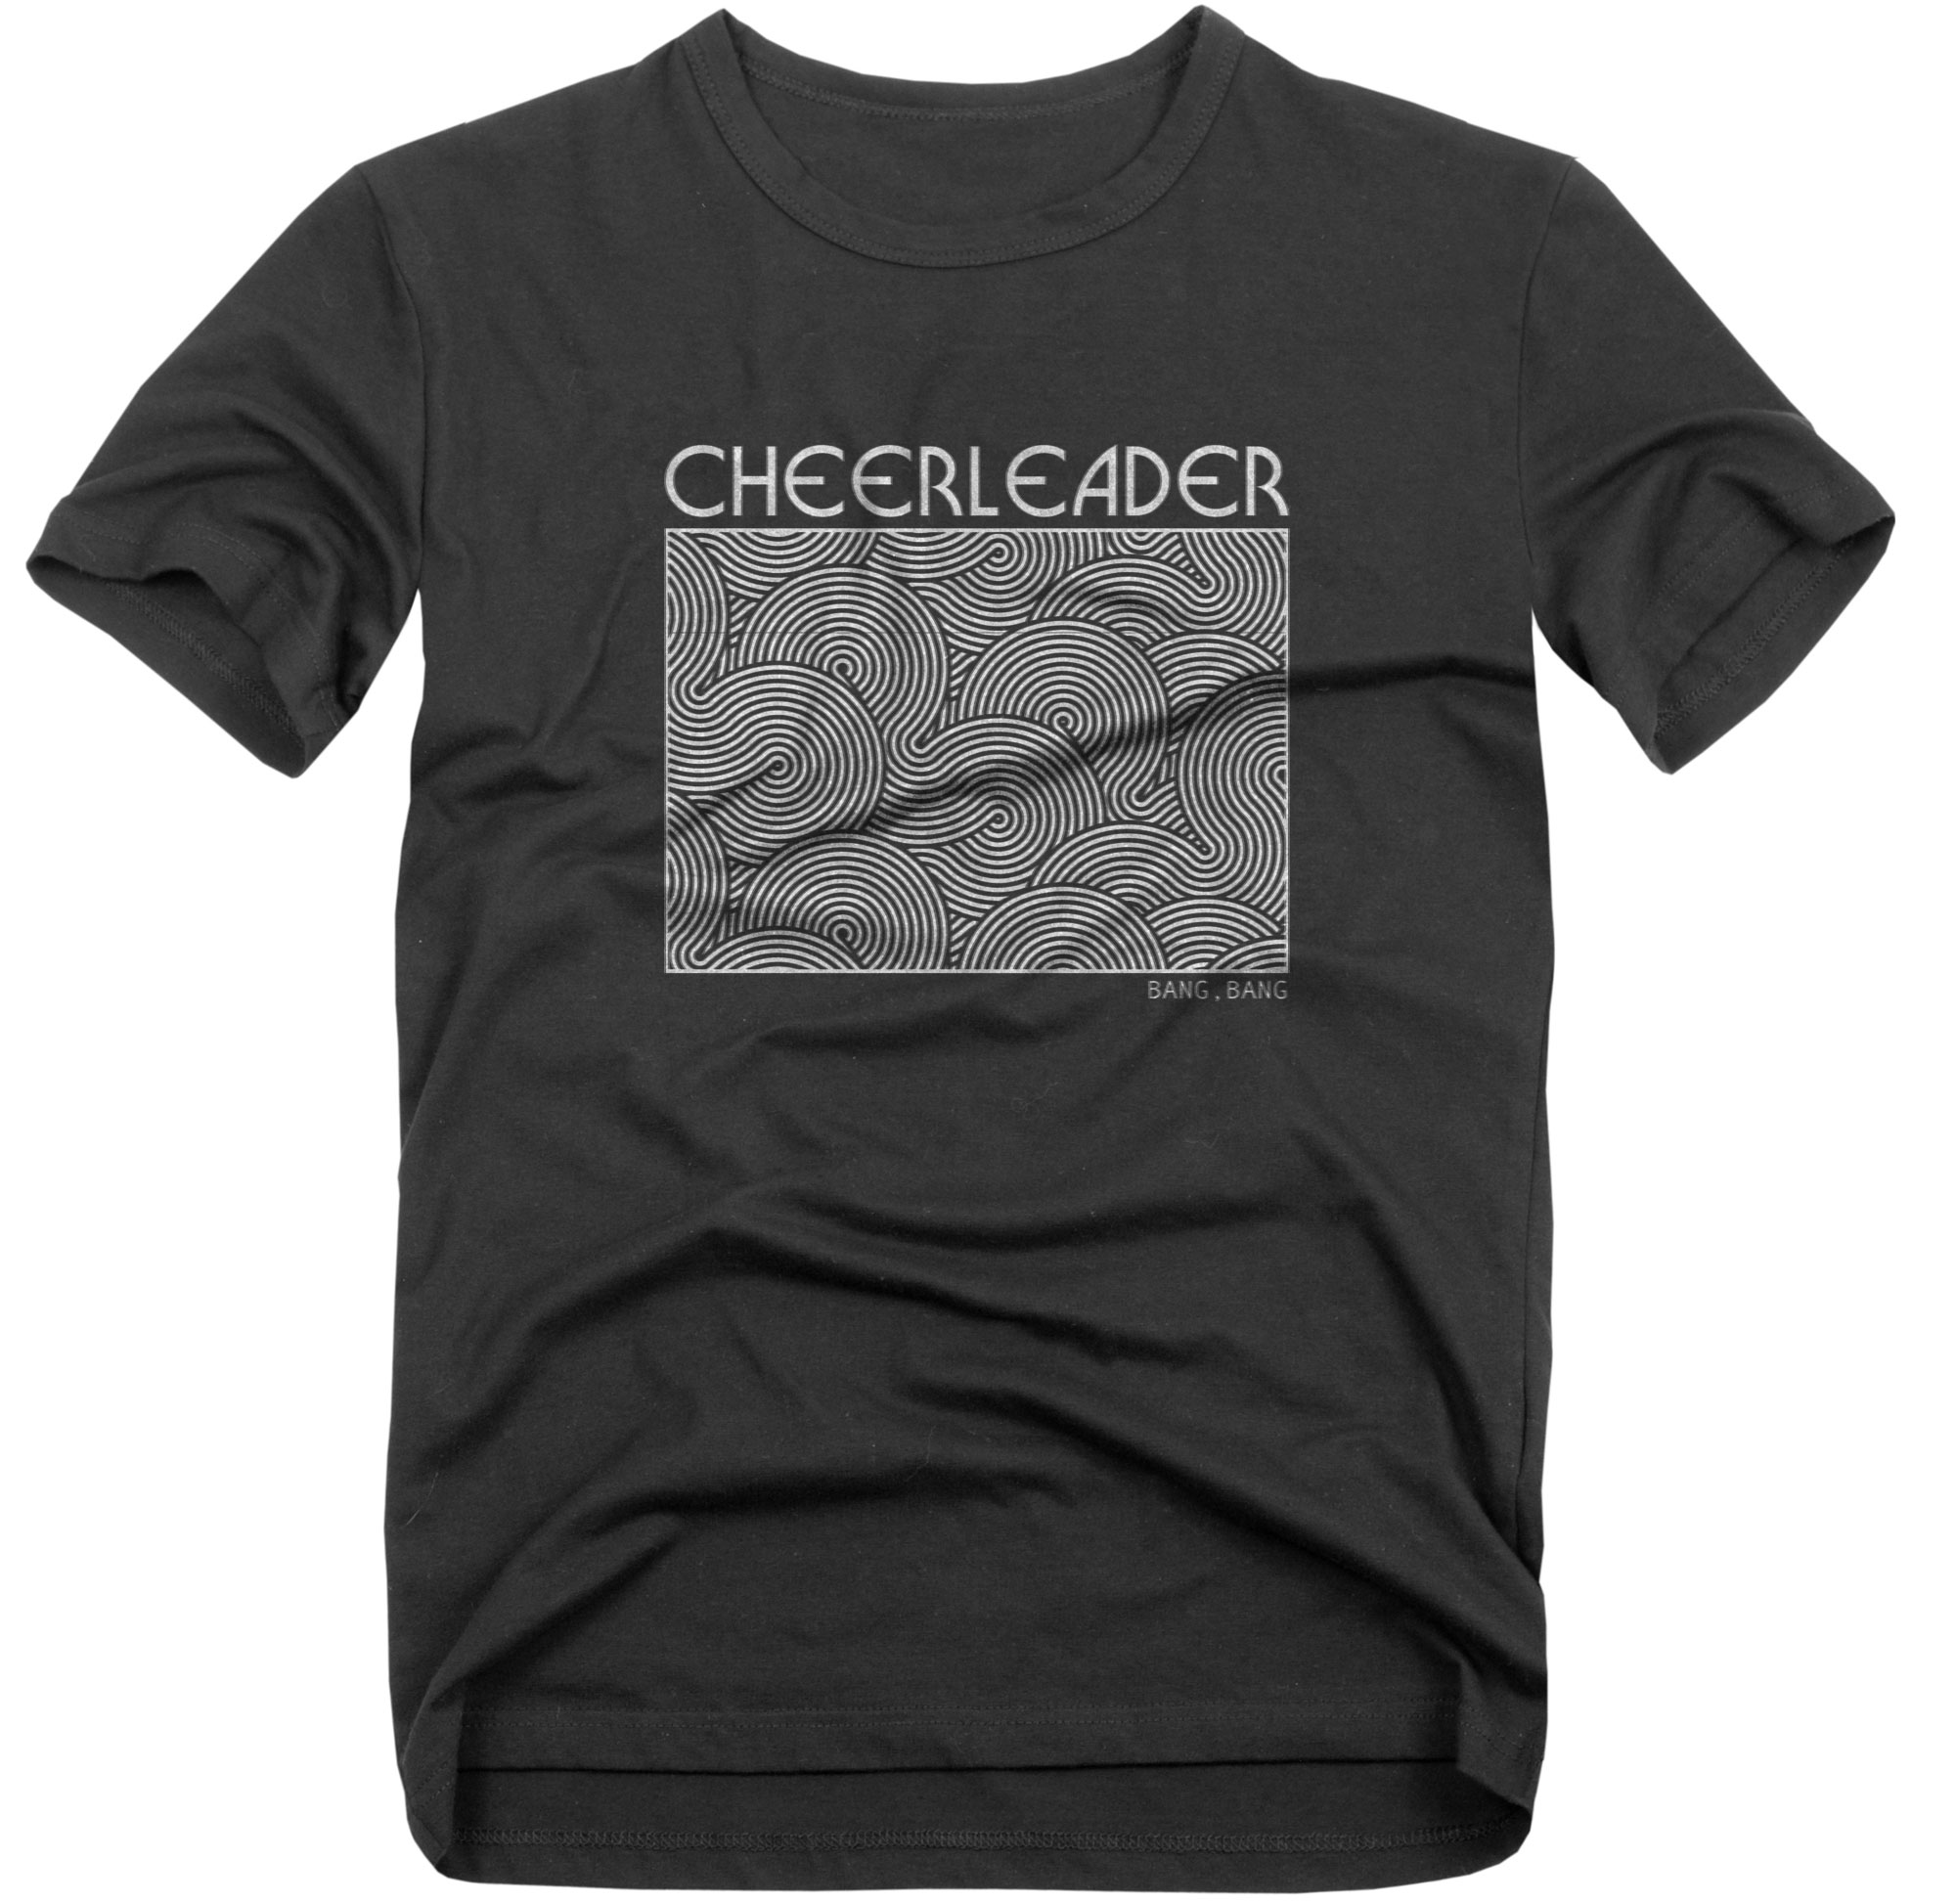 cheerleader-shirt